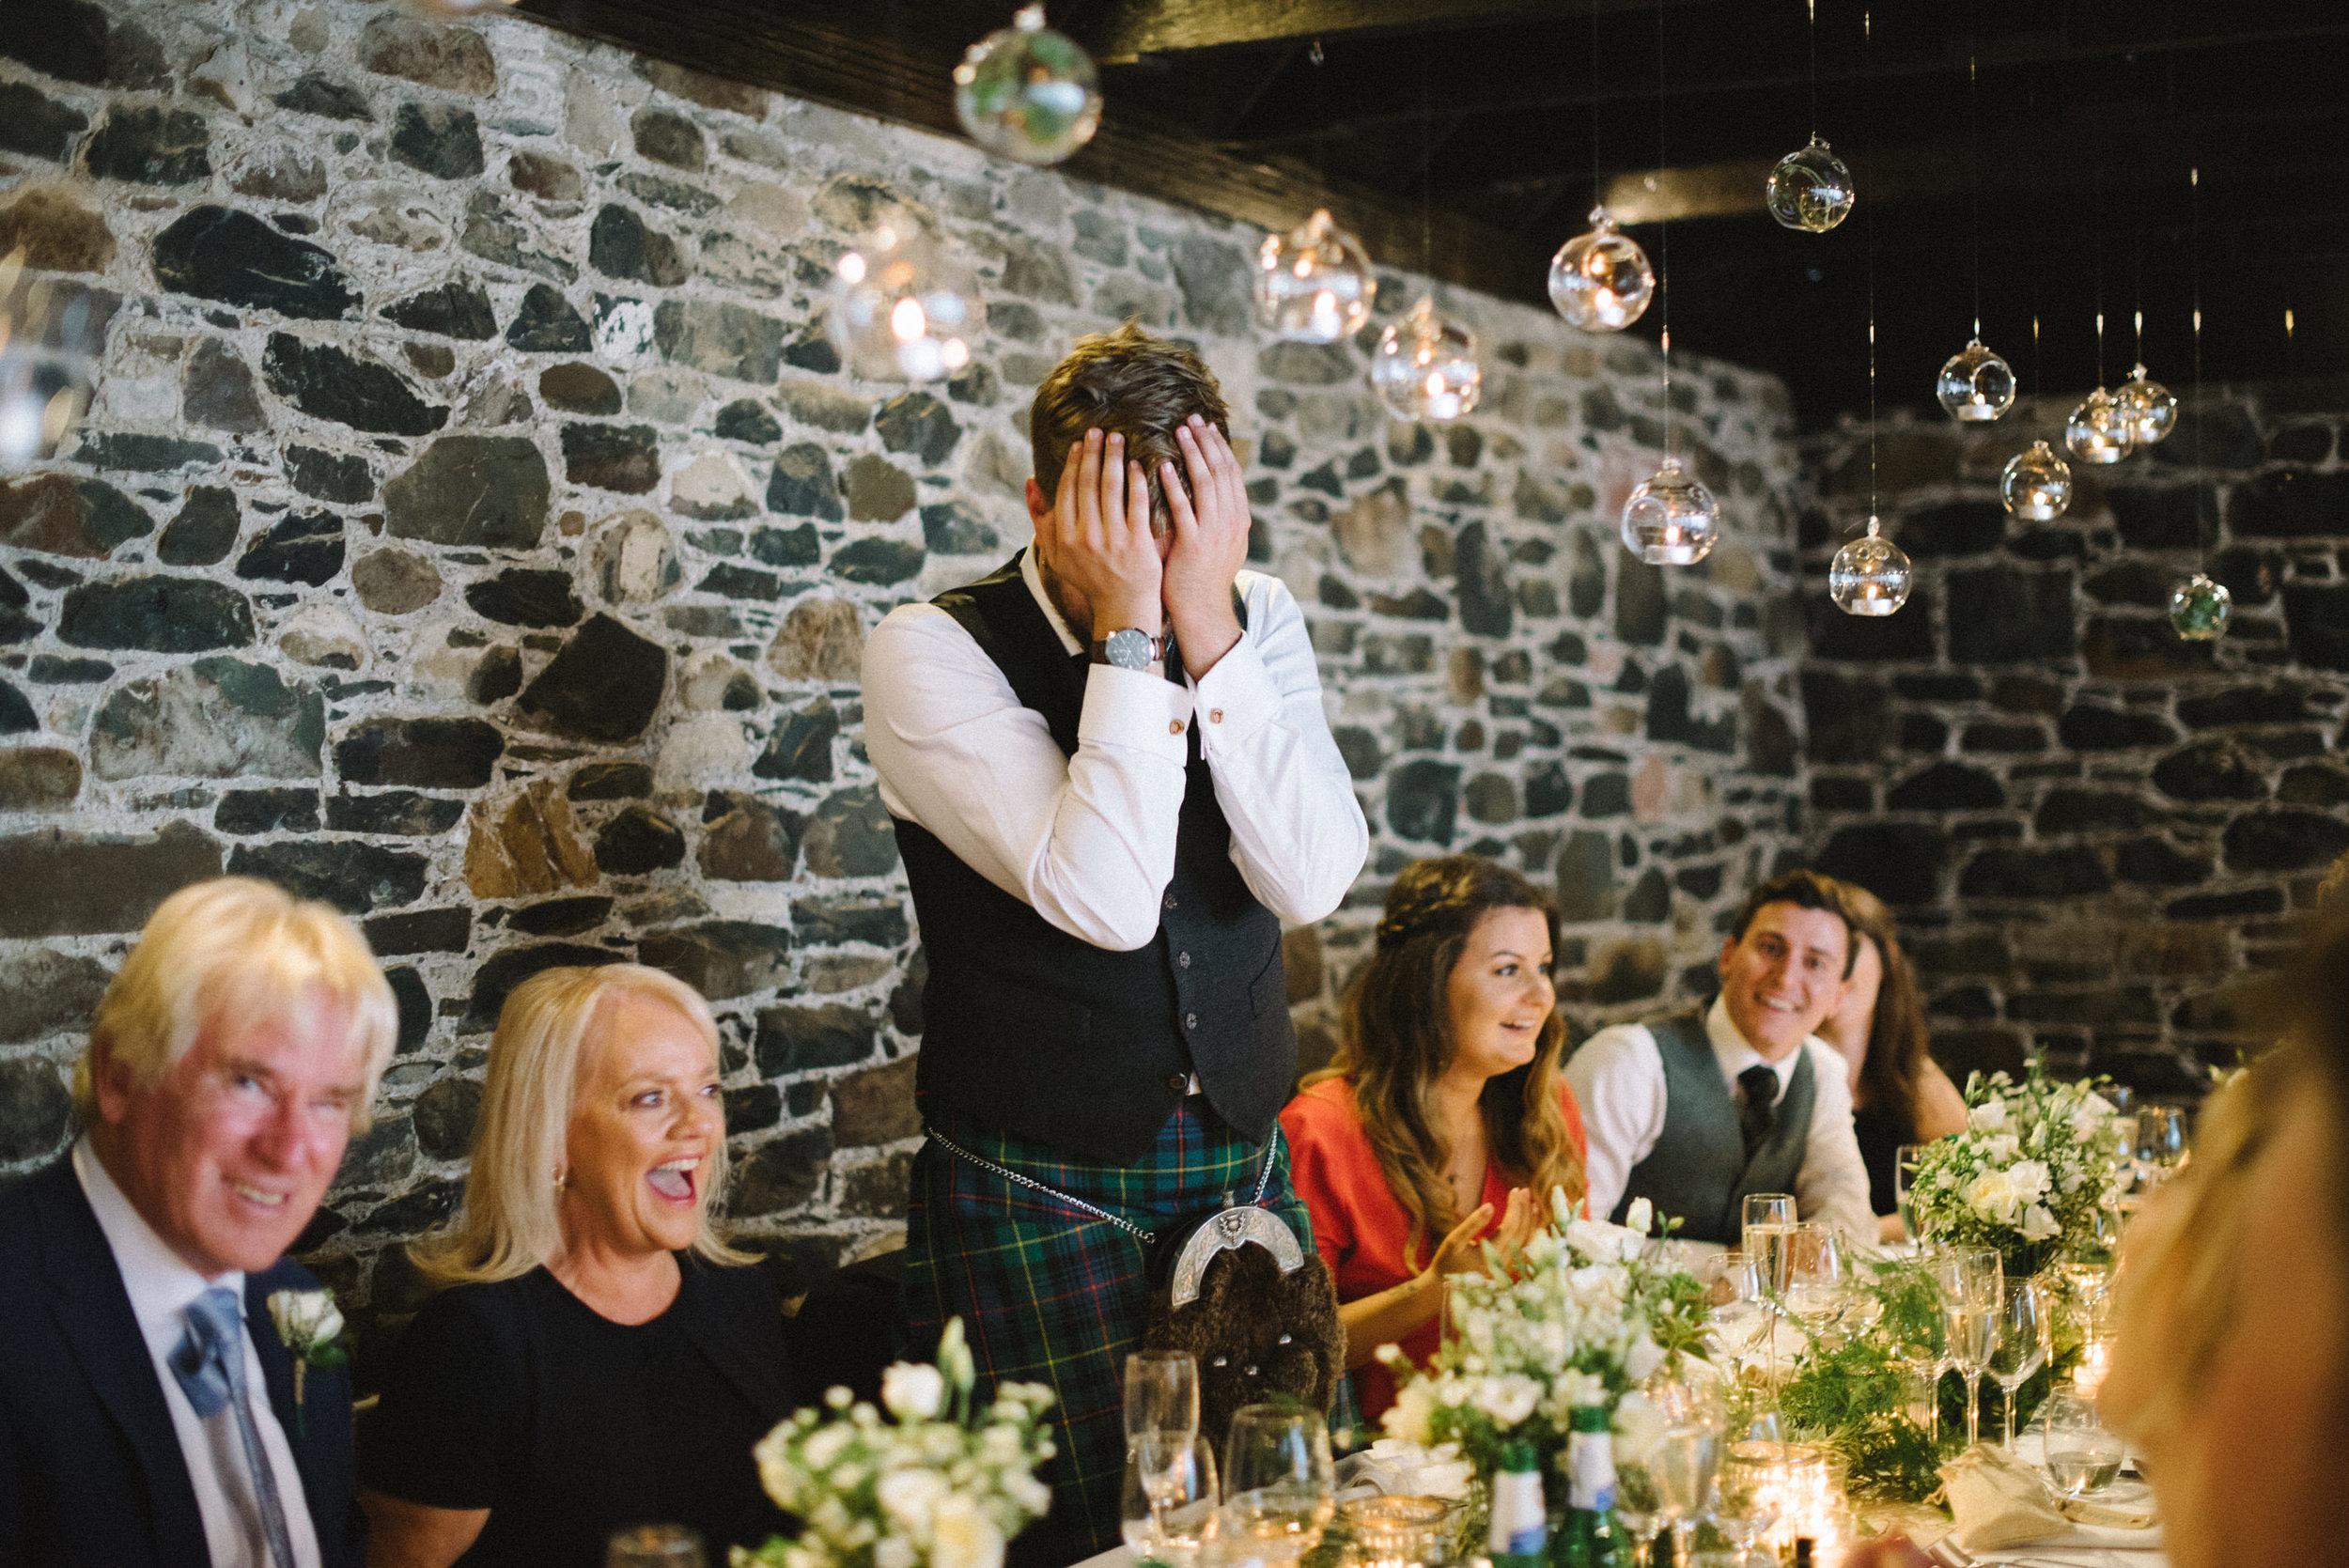 0199-LISA-DEVINE-PHOTOGRAPHY-ALTERNATIVE-WEDDING-PHOTOGRAPHY-SCOTLAND-DESTINATION-WEDDINGS-GLASGOW-WEDDINGS-COOL-WEDDINGS-STYLISH-WEDDINGS.JPG